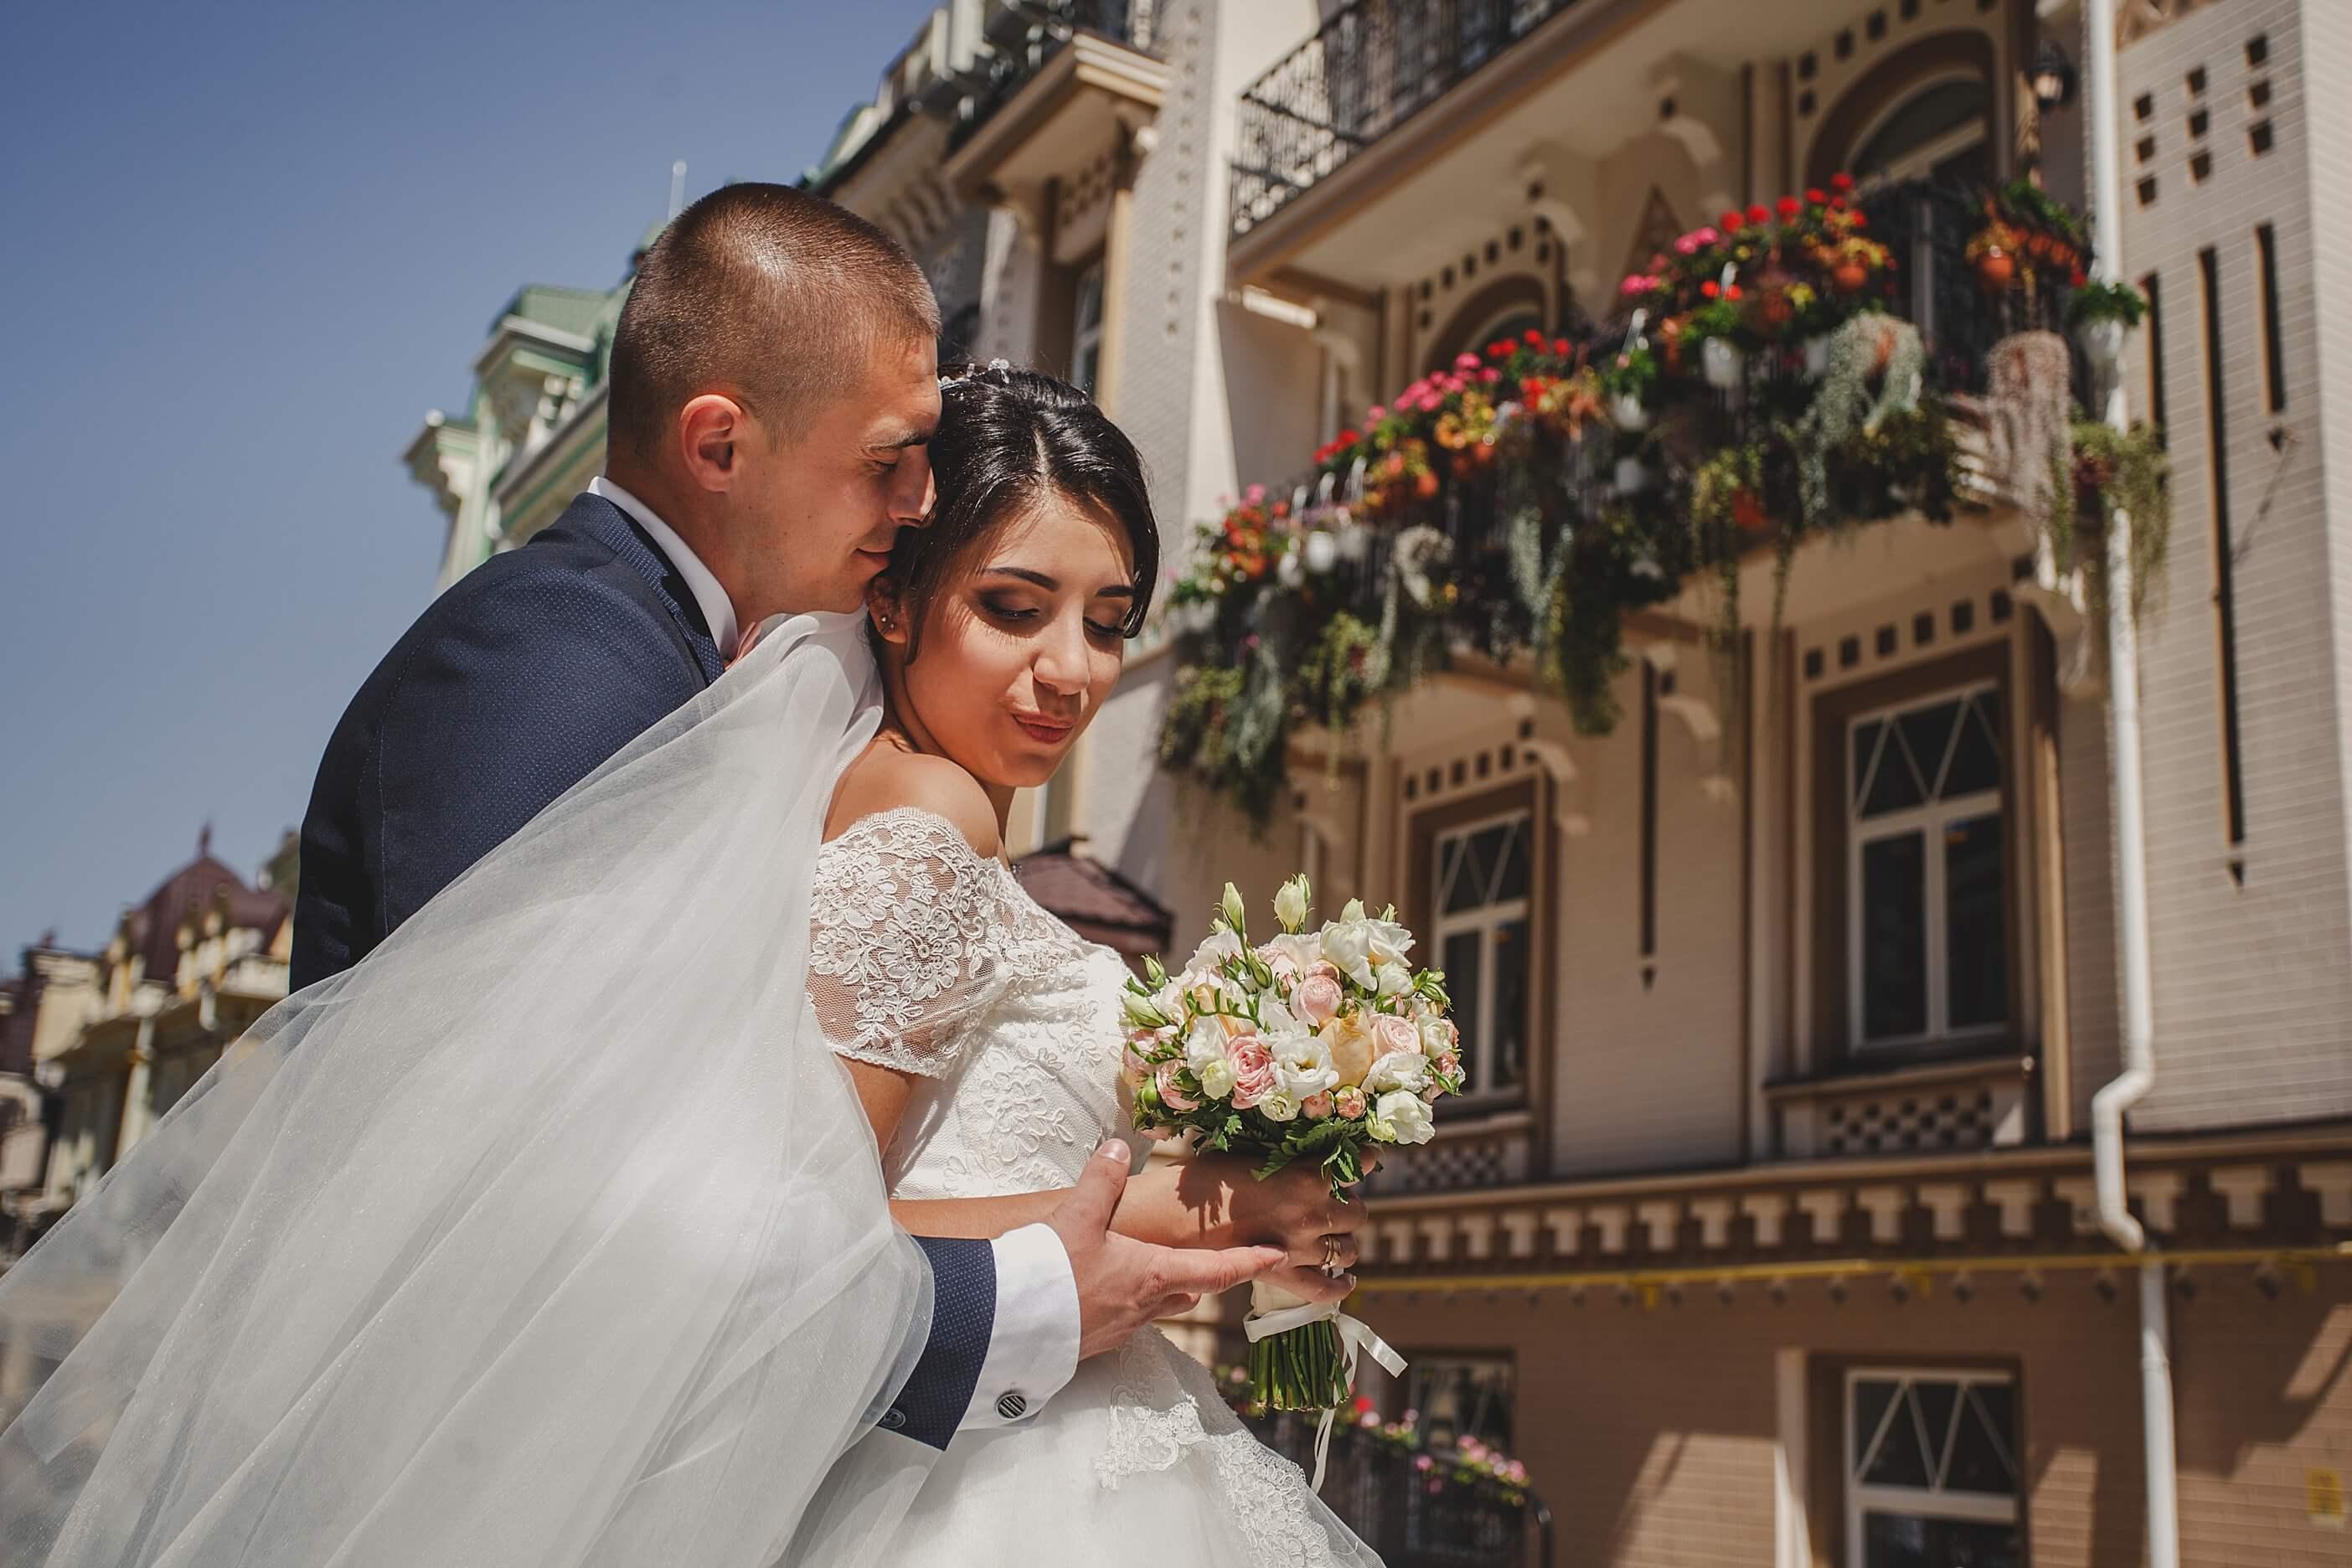 видеооператор на свадьбу фотограф на свадьбу